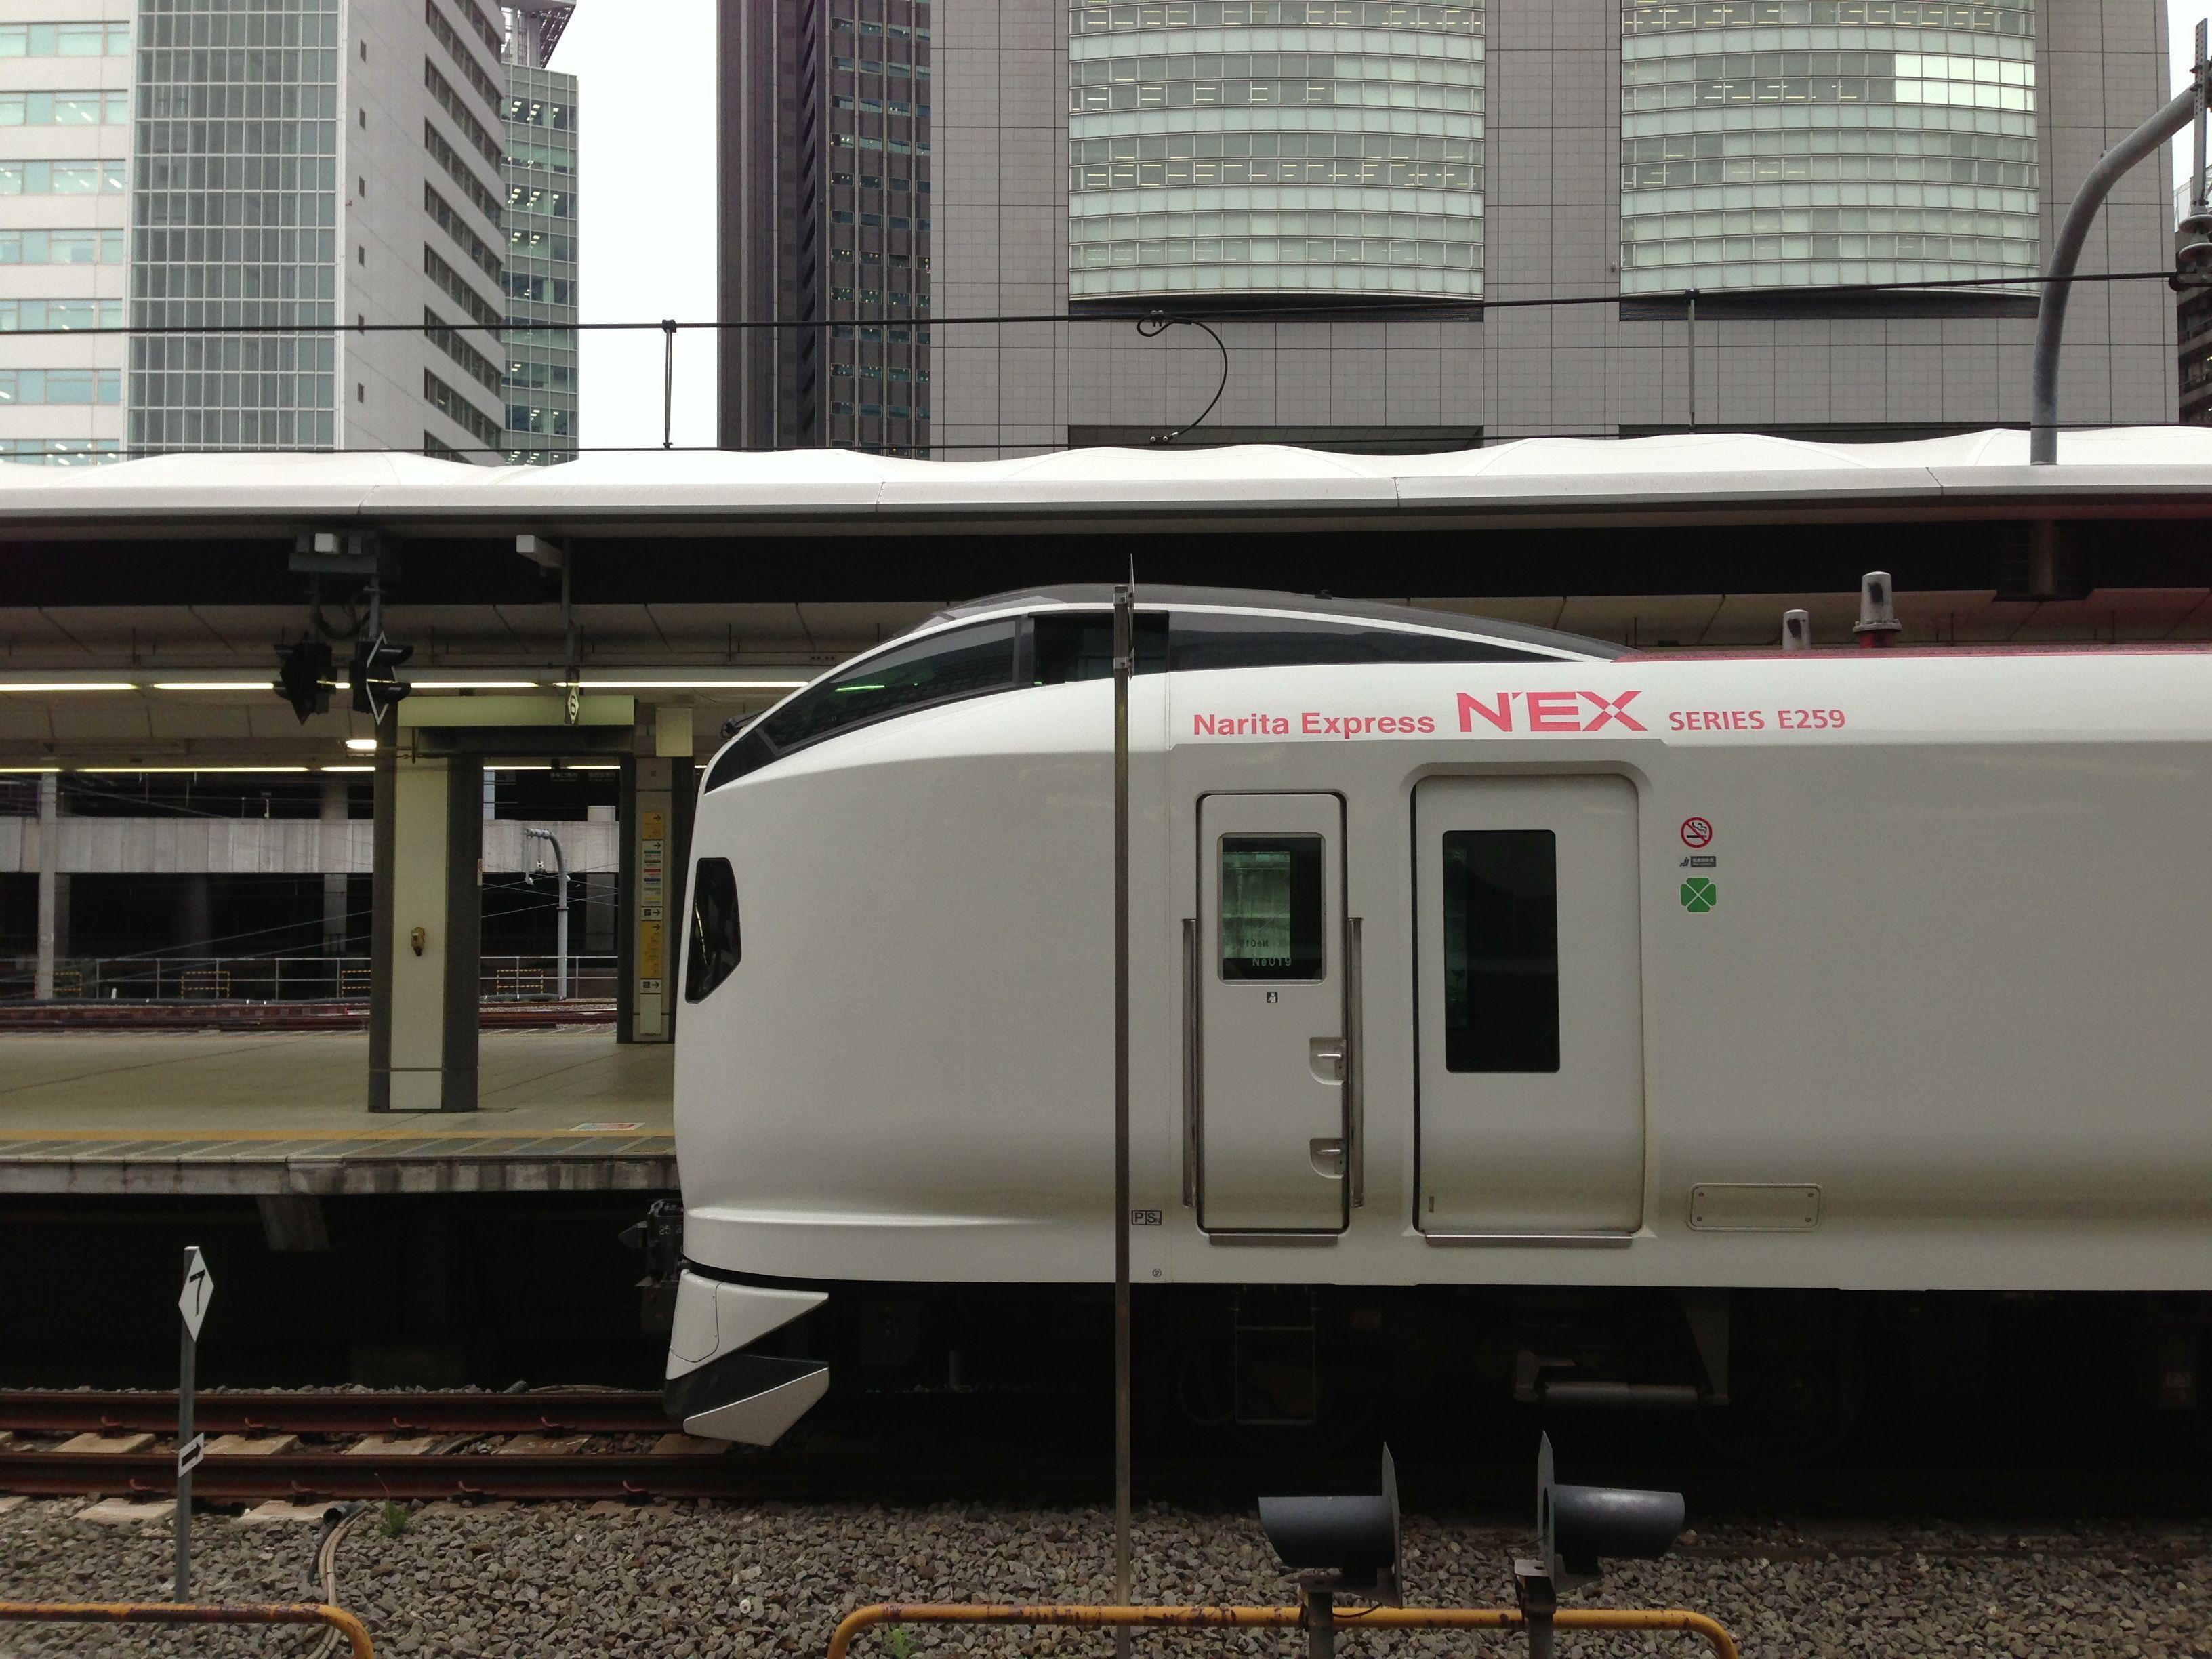 The Narita Express between Shinjyuku station to Narita airport.